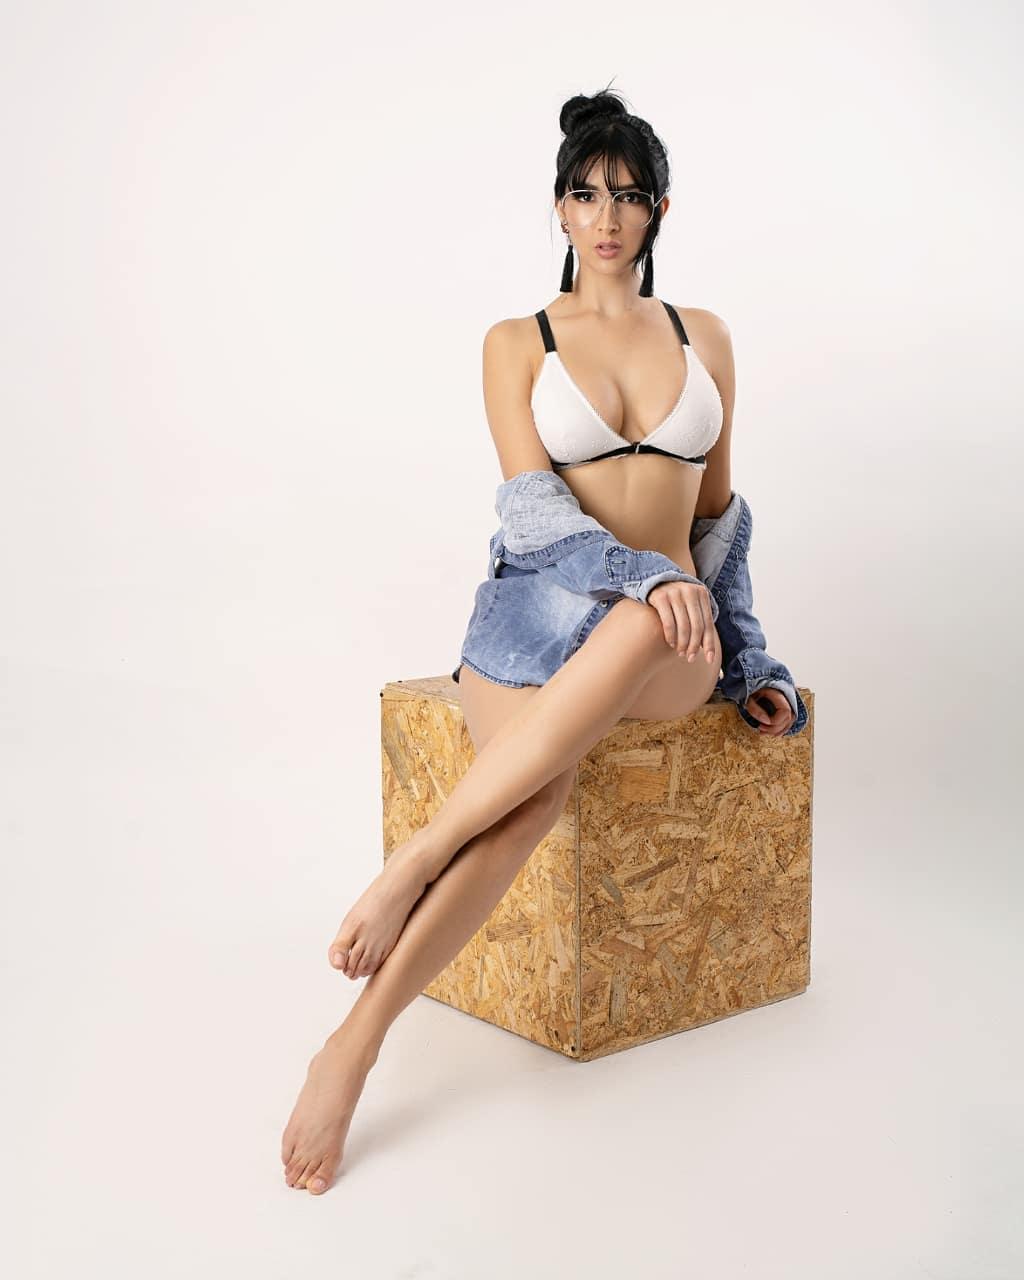 Kathy Moscoso